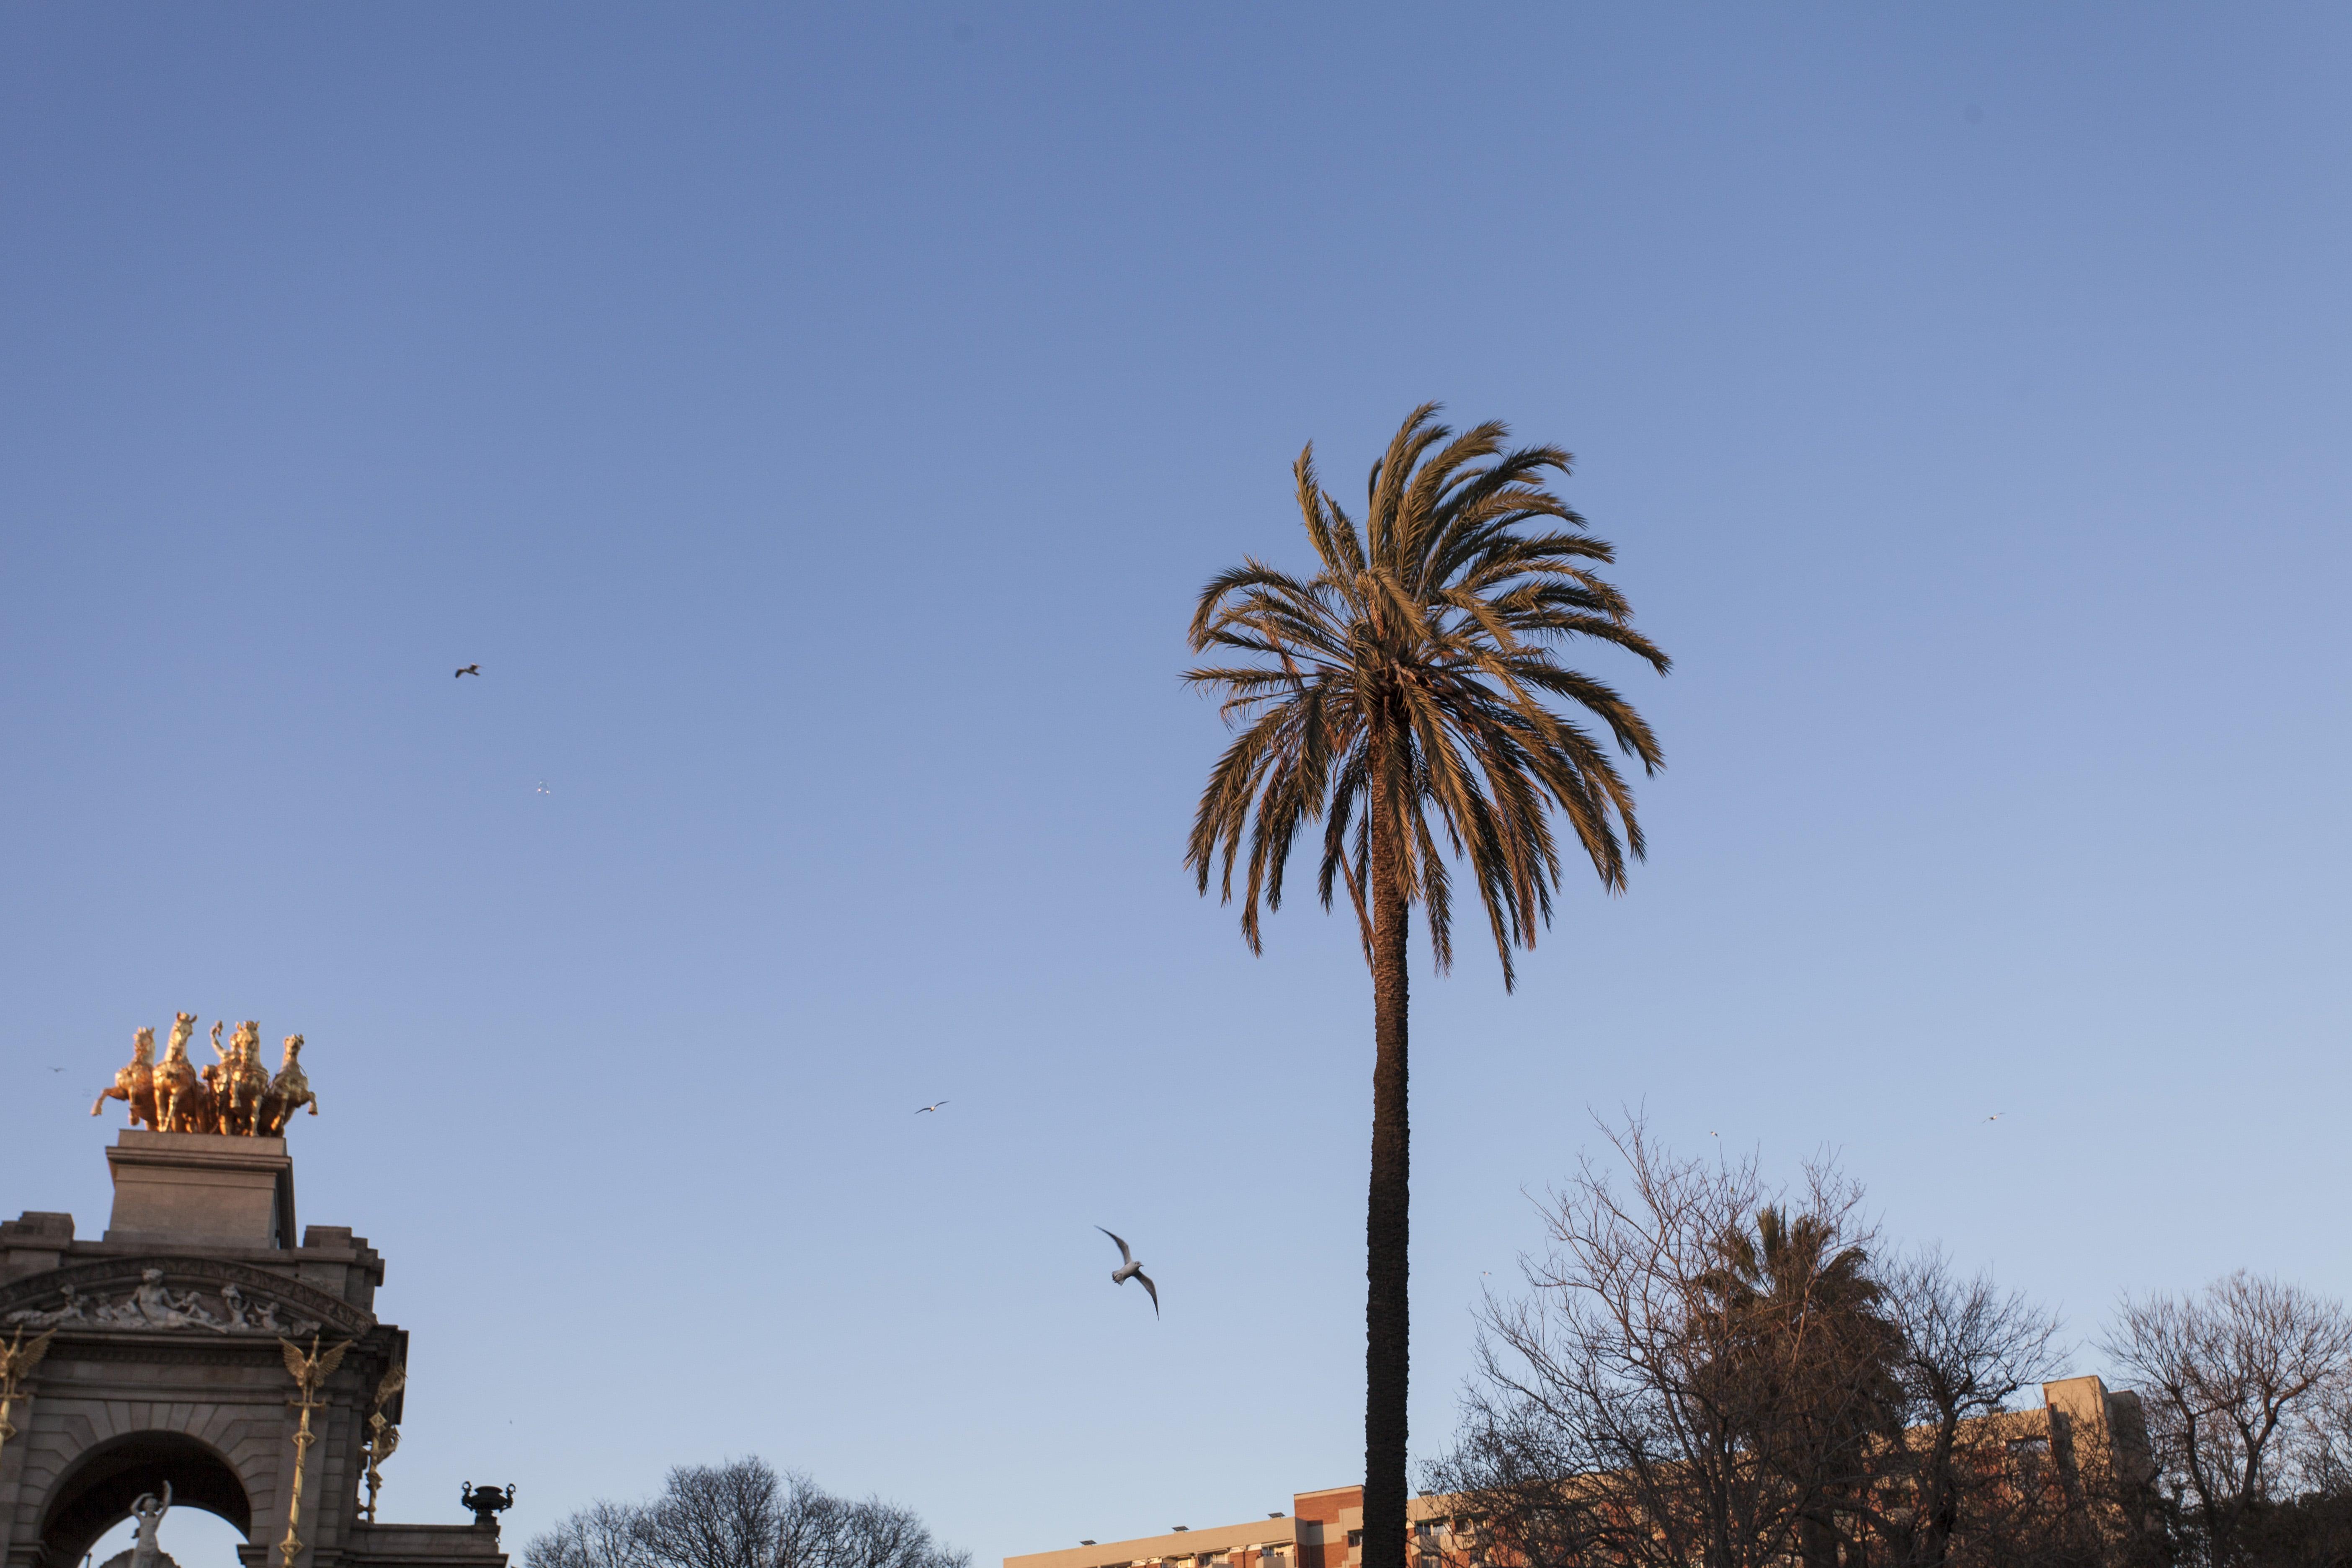 Barcelone City trip